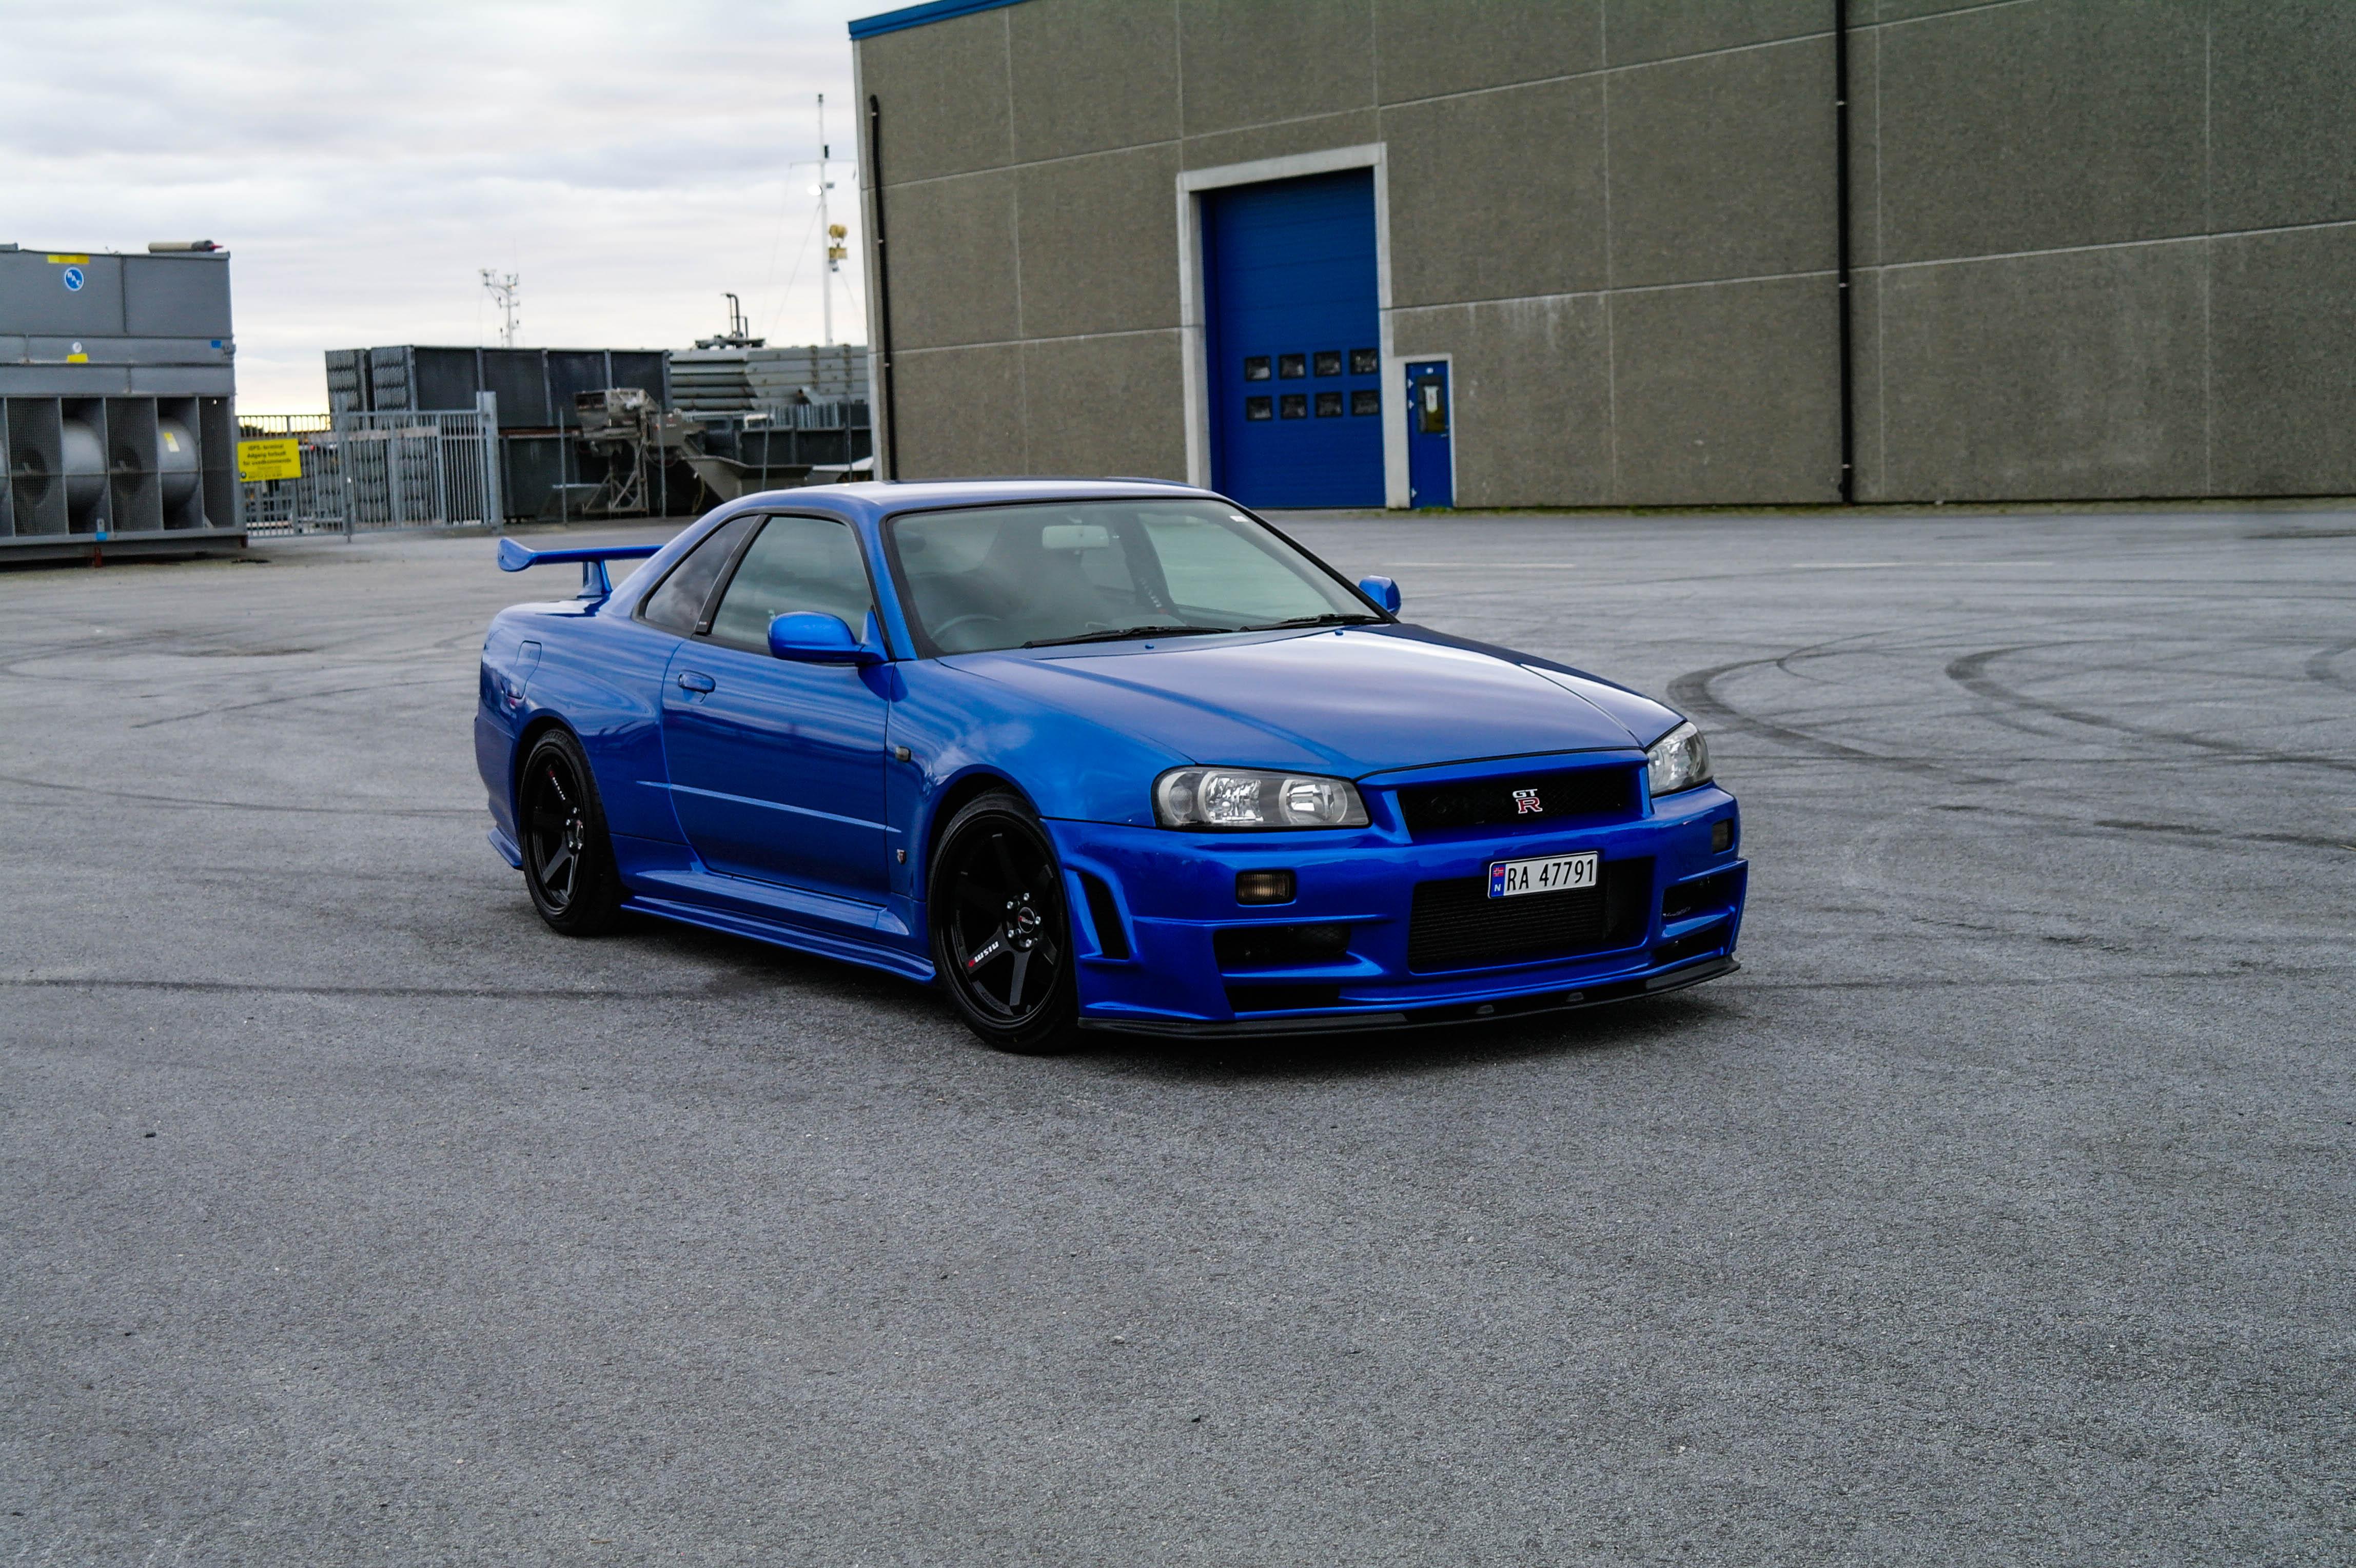 Ukas bil - 1999 Nissan Skyline GTR V-Spec